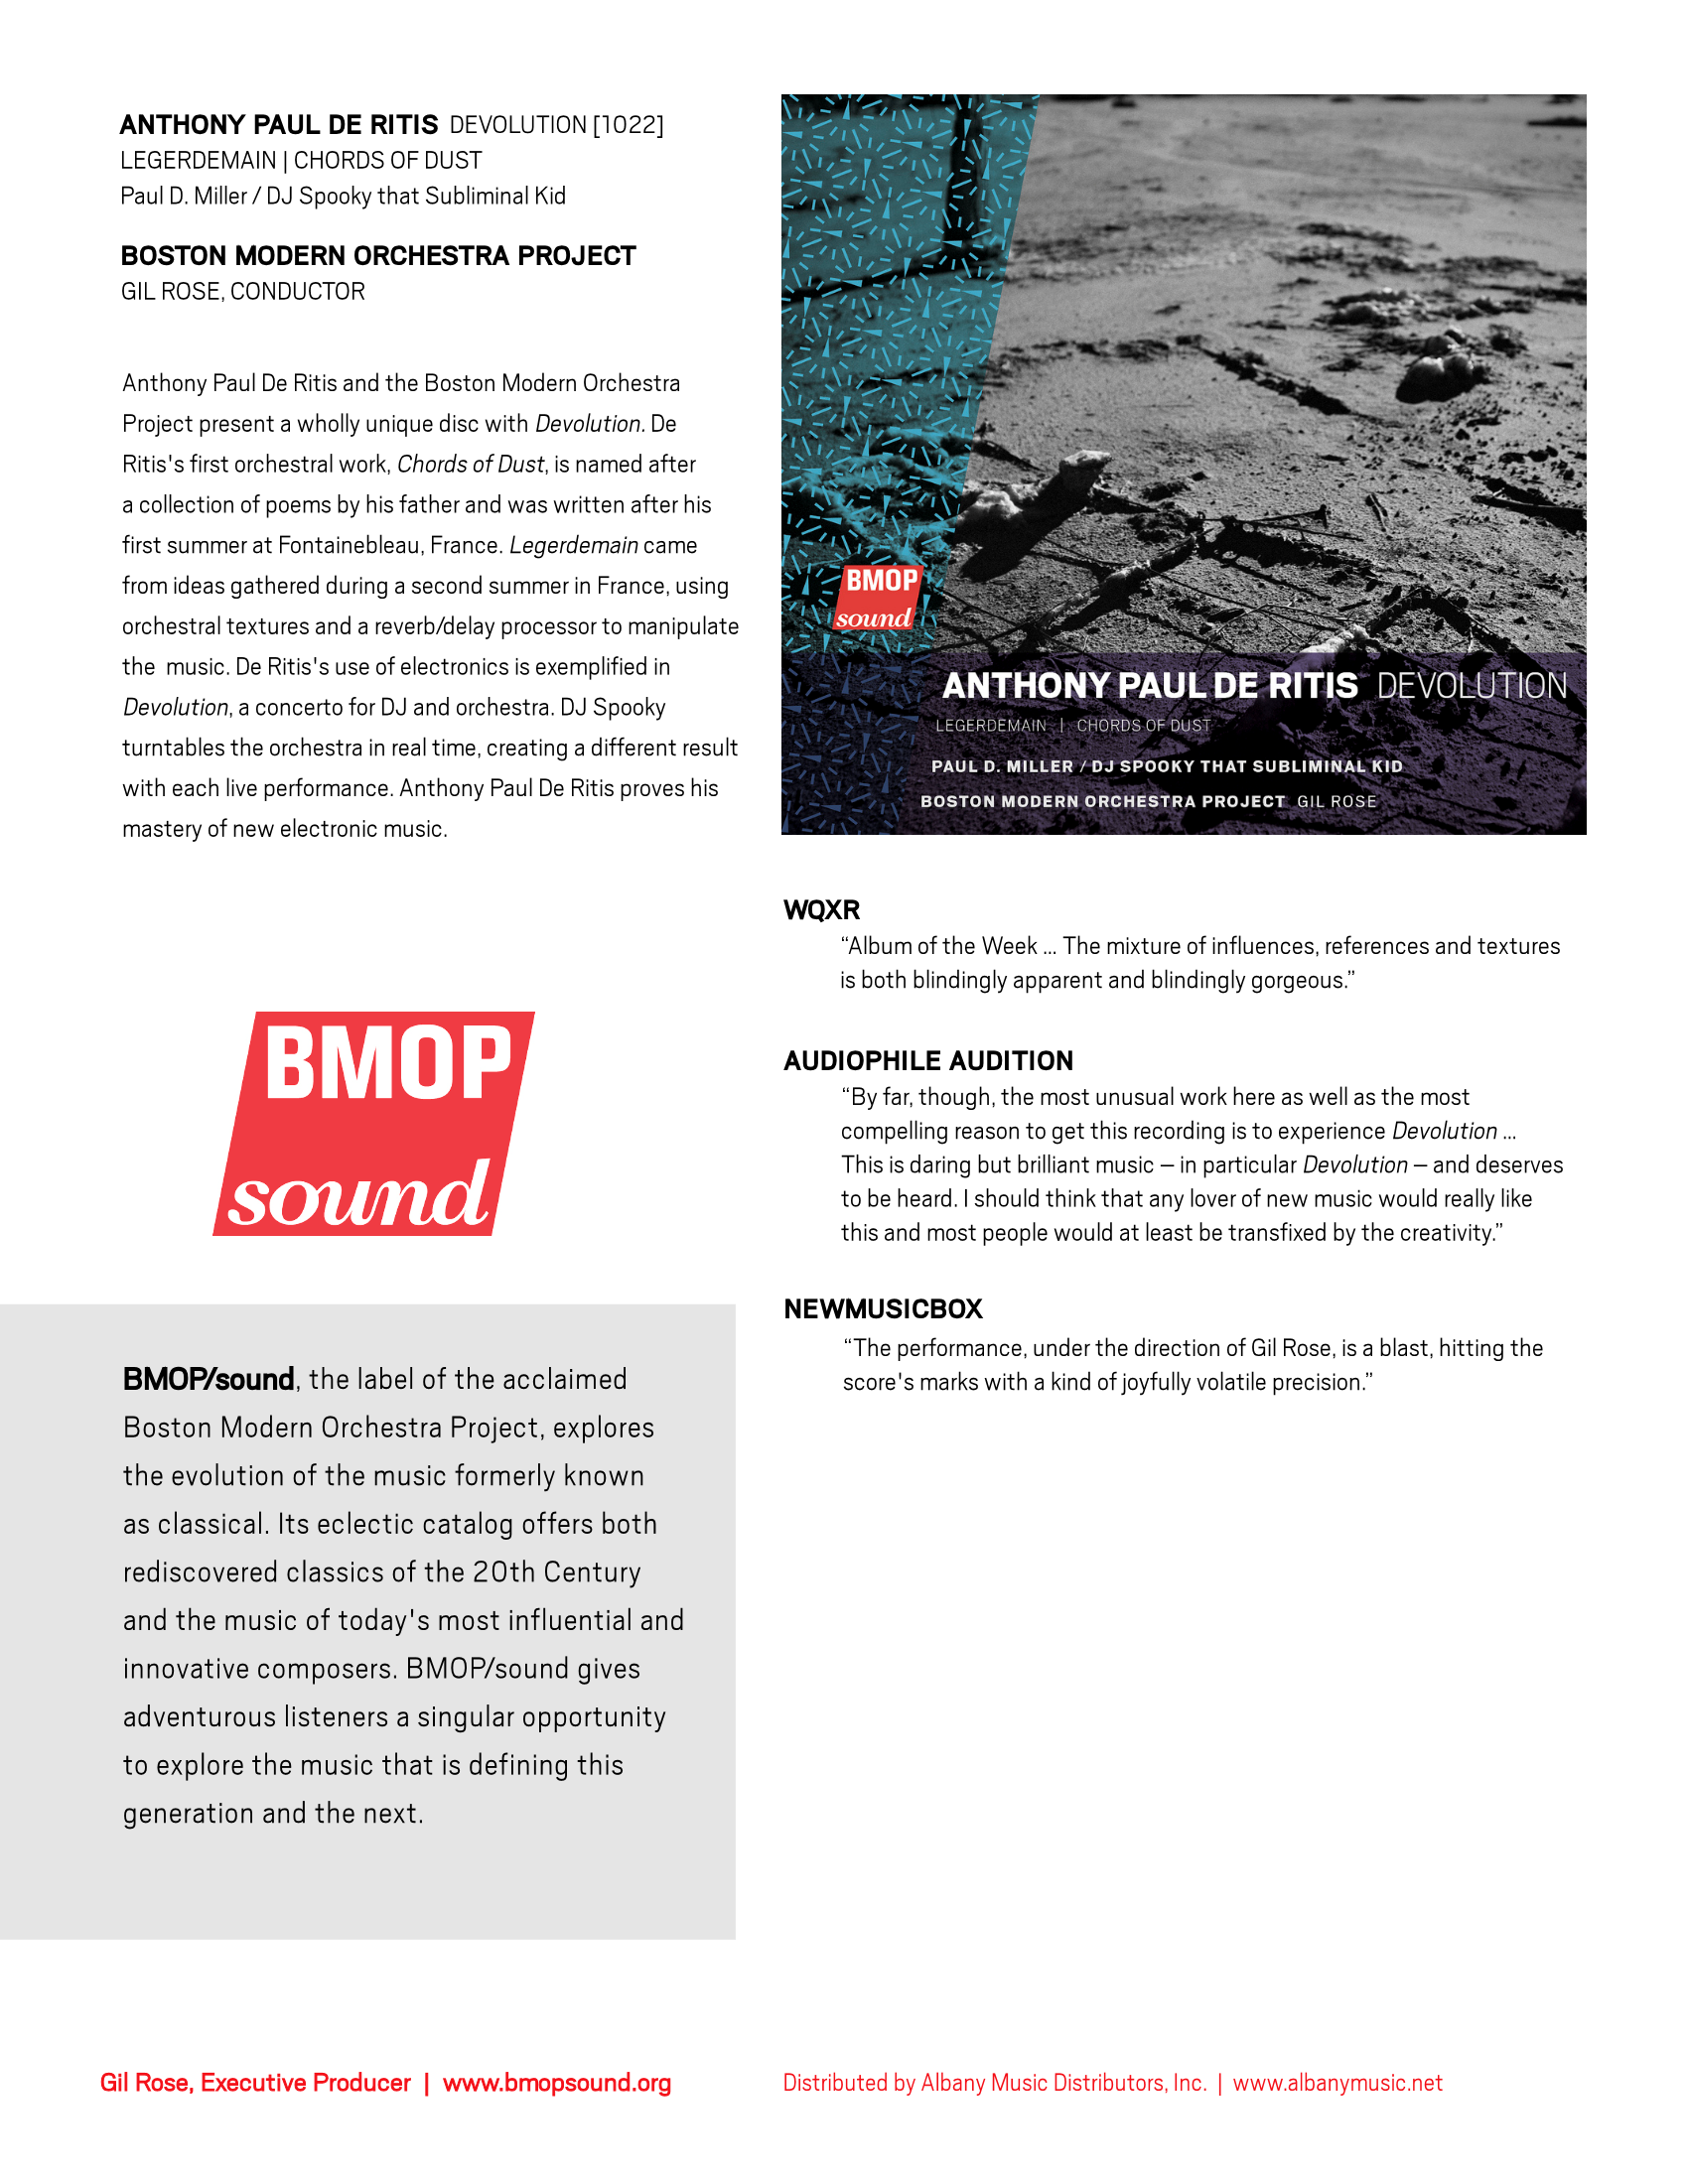 De Ritis - BMOPsound 1022 one-sheet.png